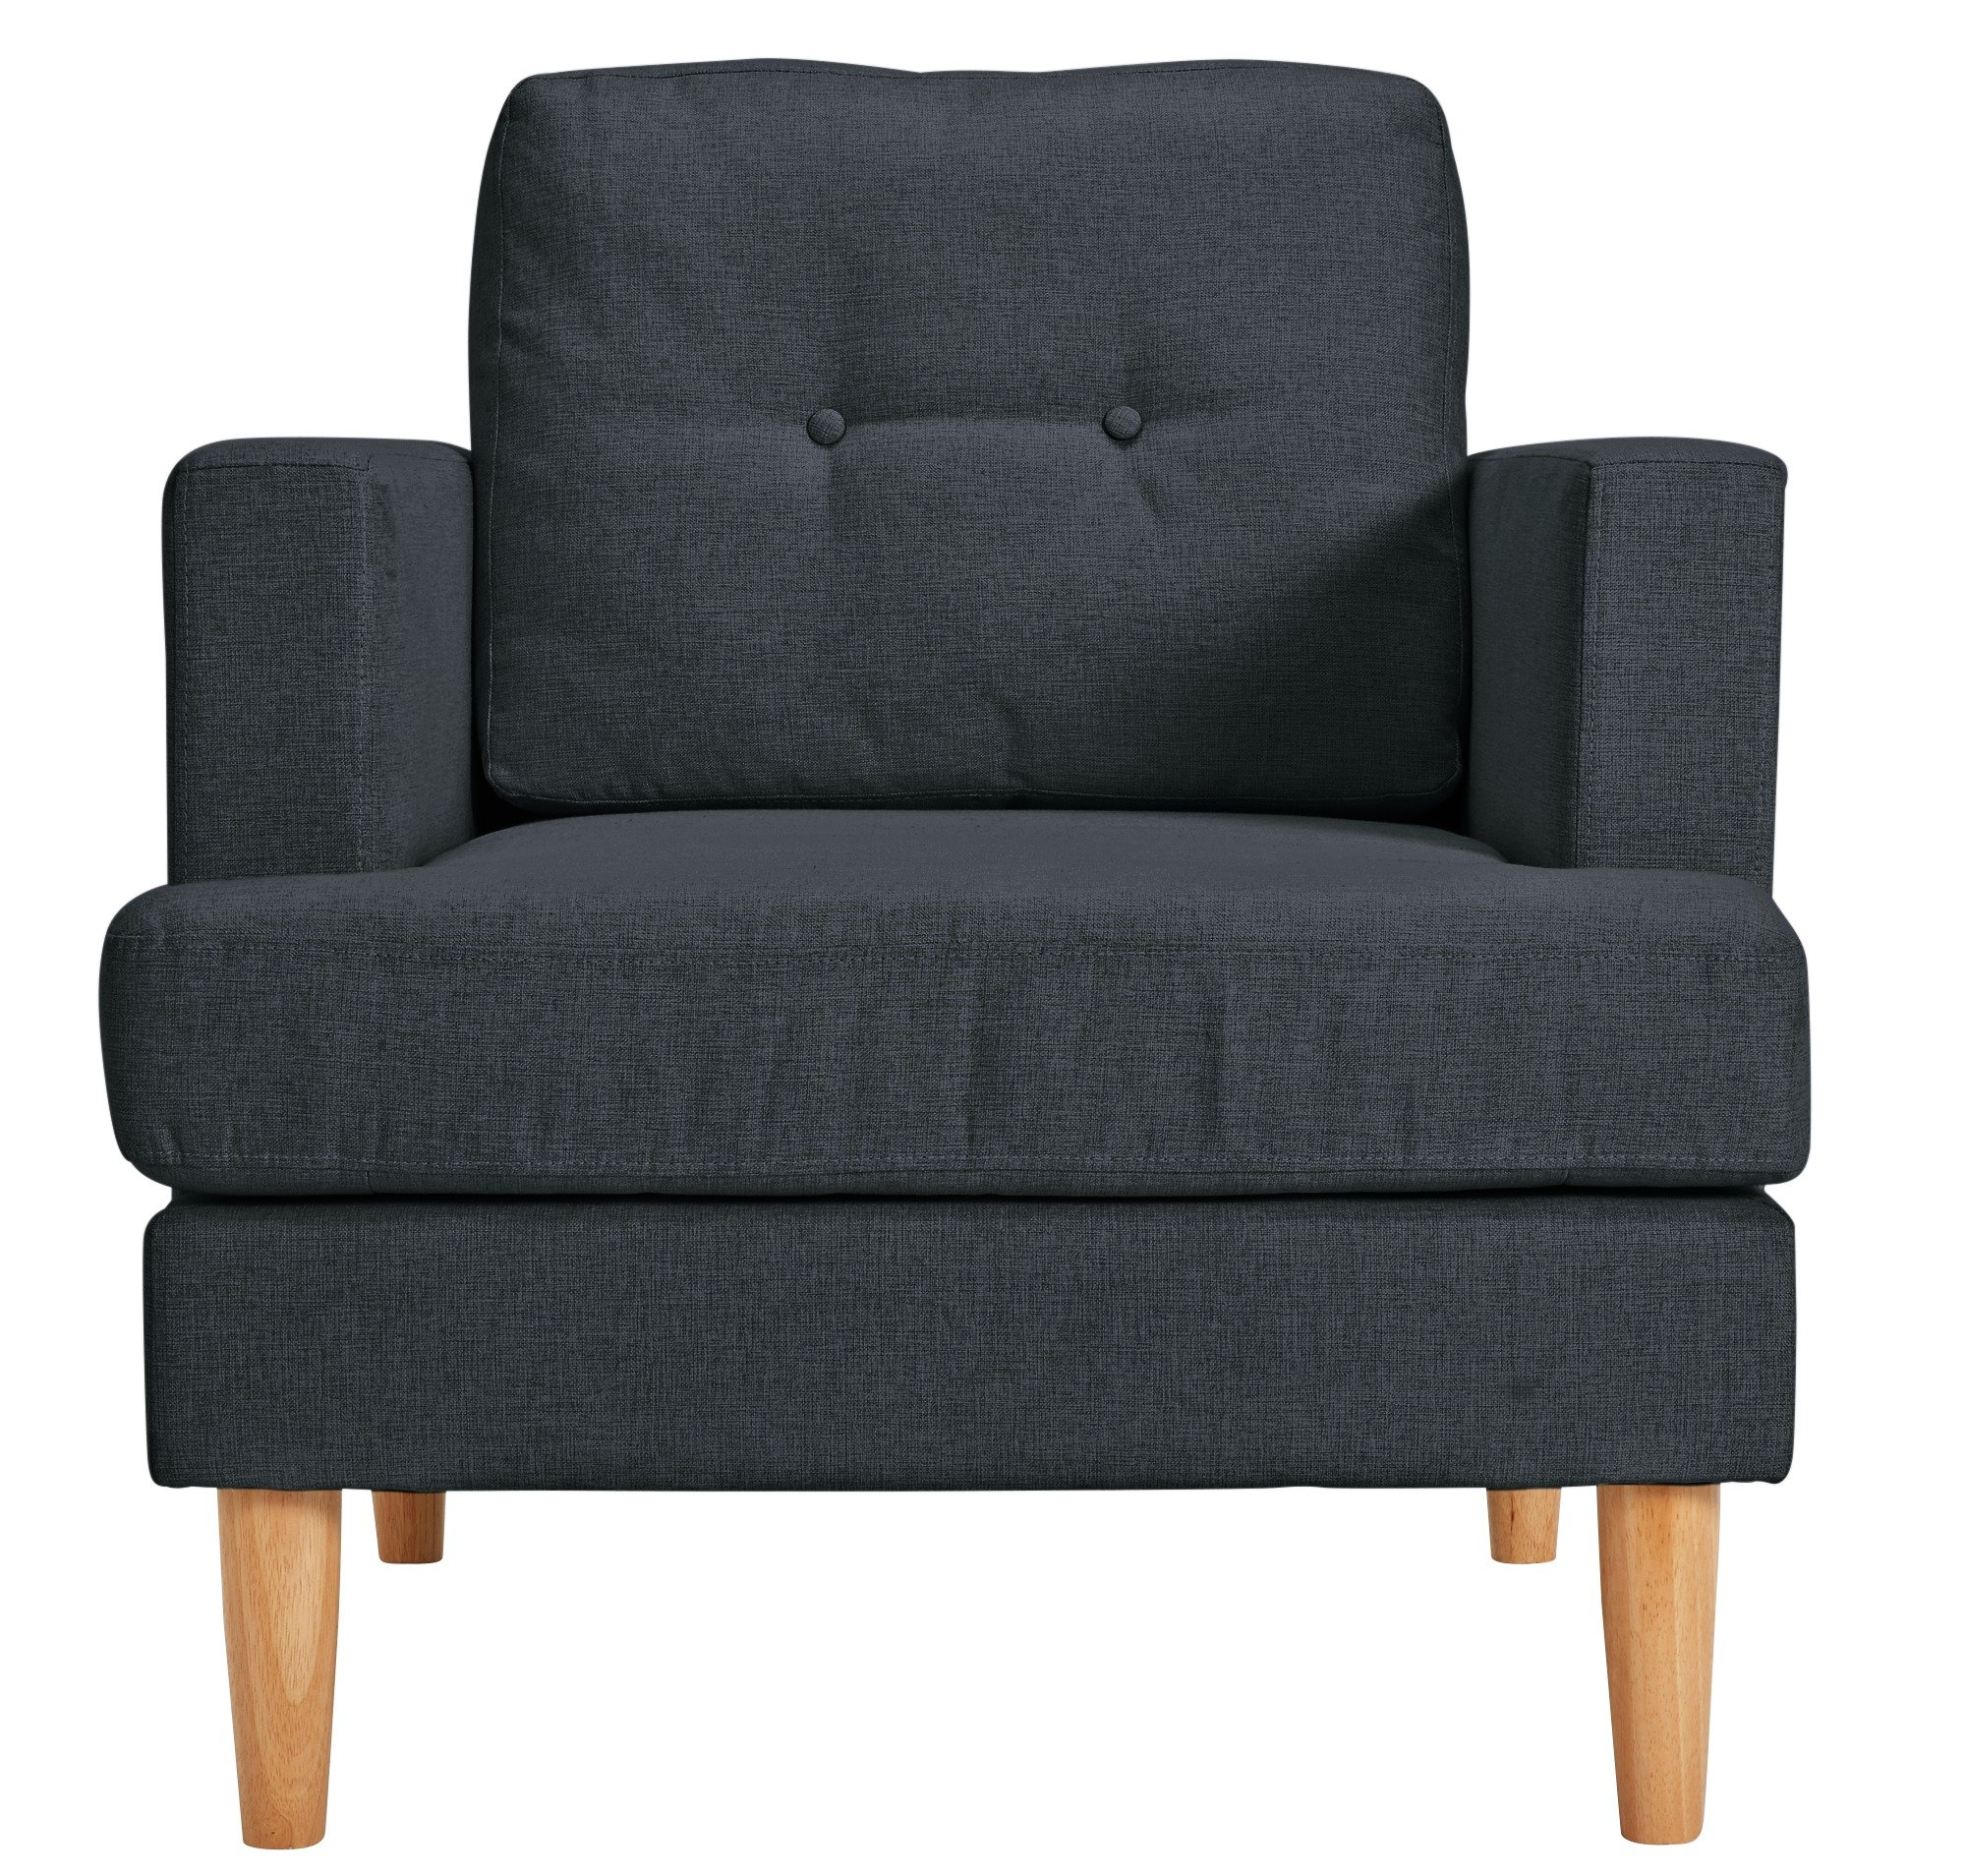 Argos Home Joshua Fabric Armchair - Charcoal